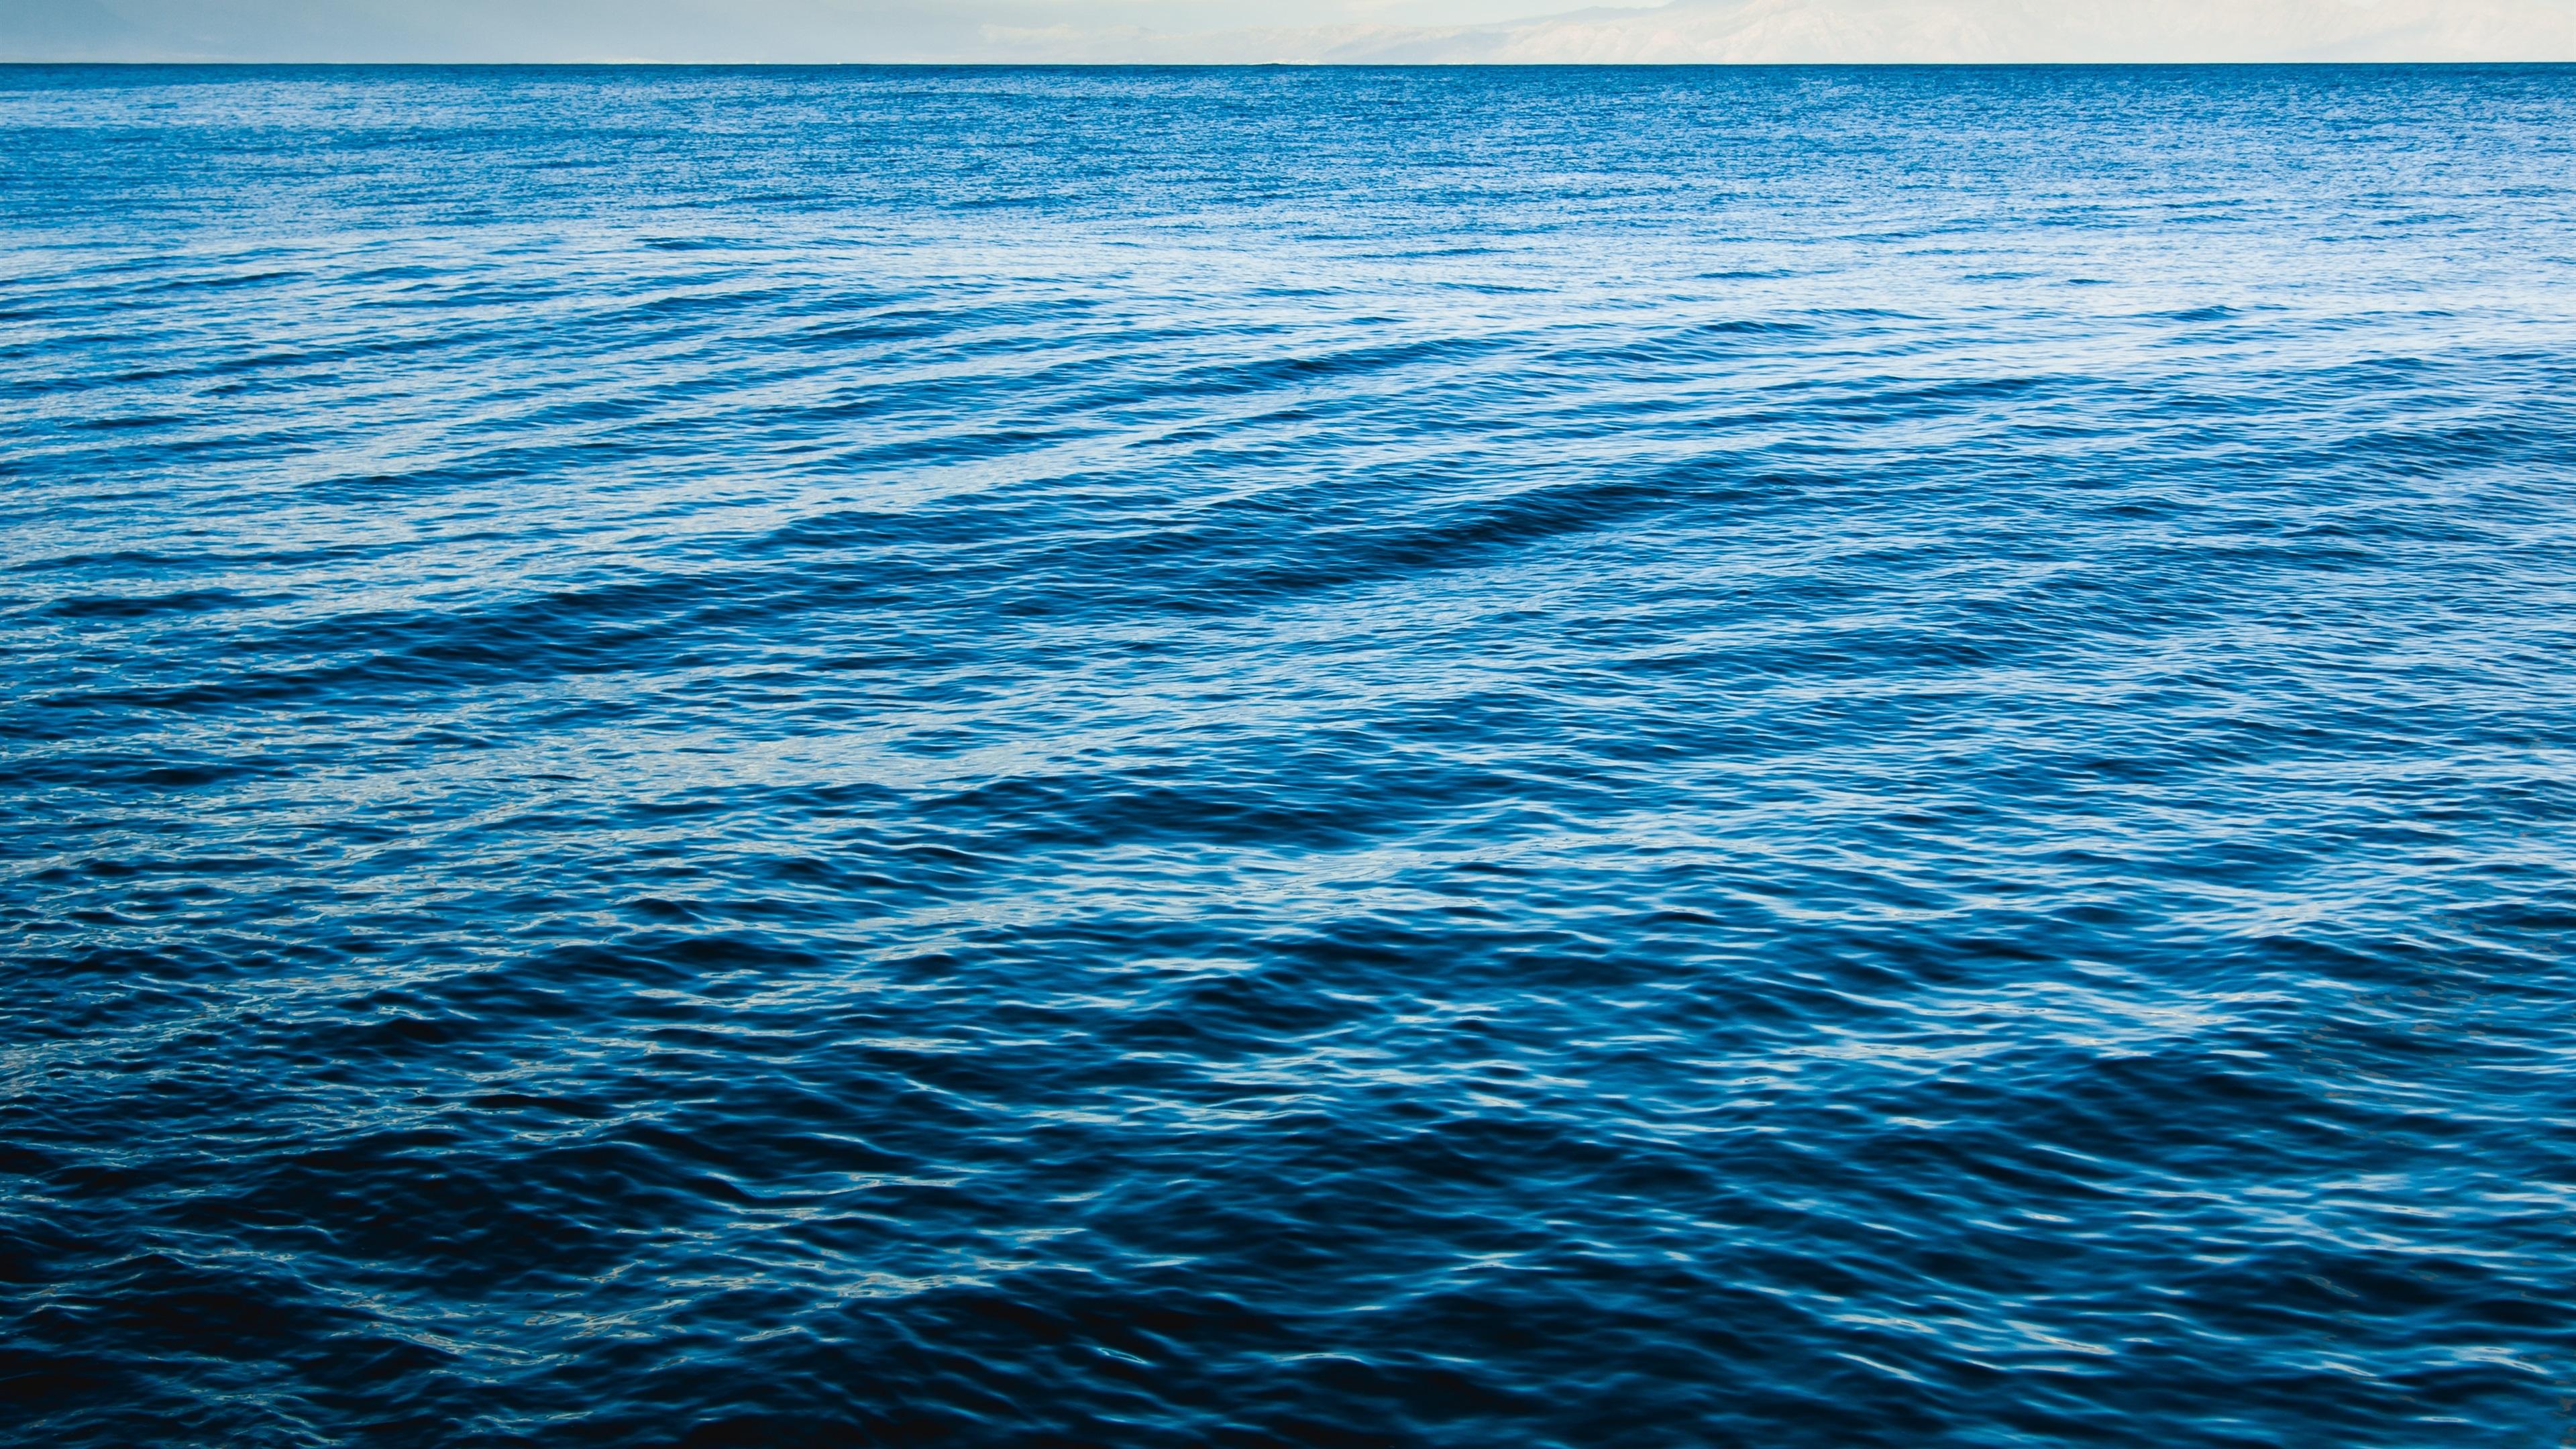 Papéis De Parede Mar, Ondas, Azul, Natureza 3840x2160 UHD